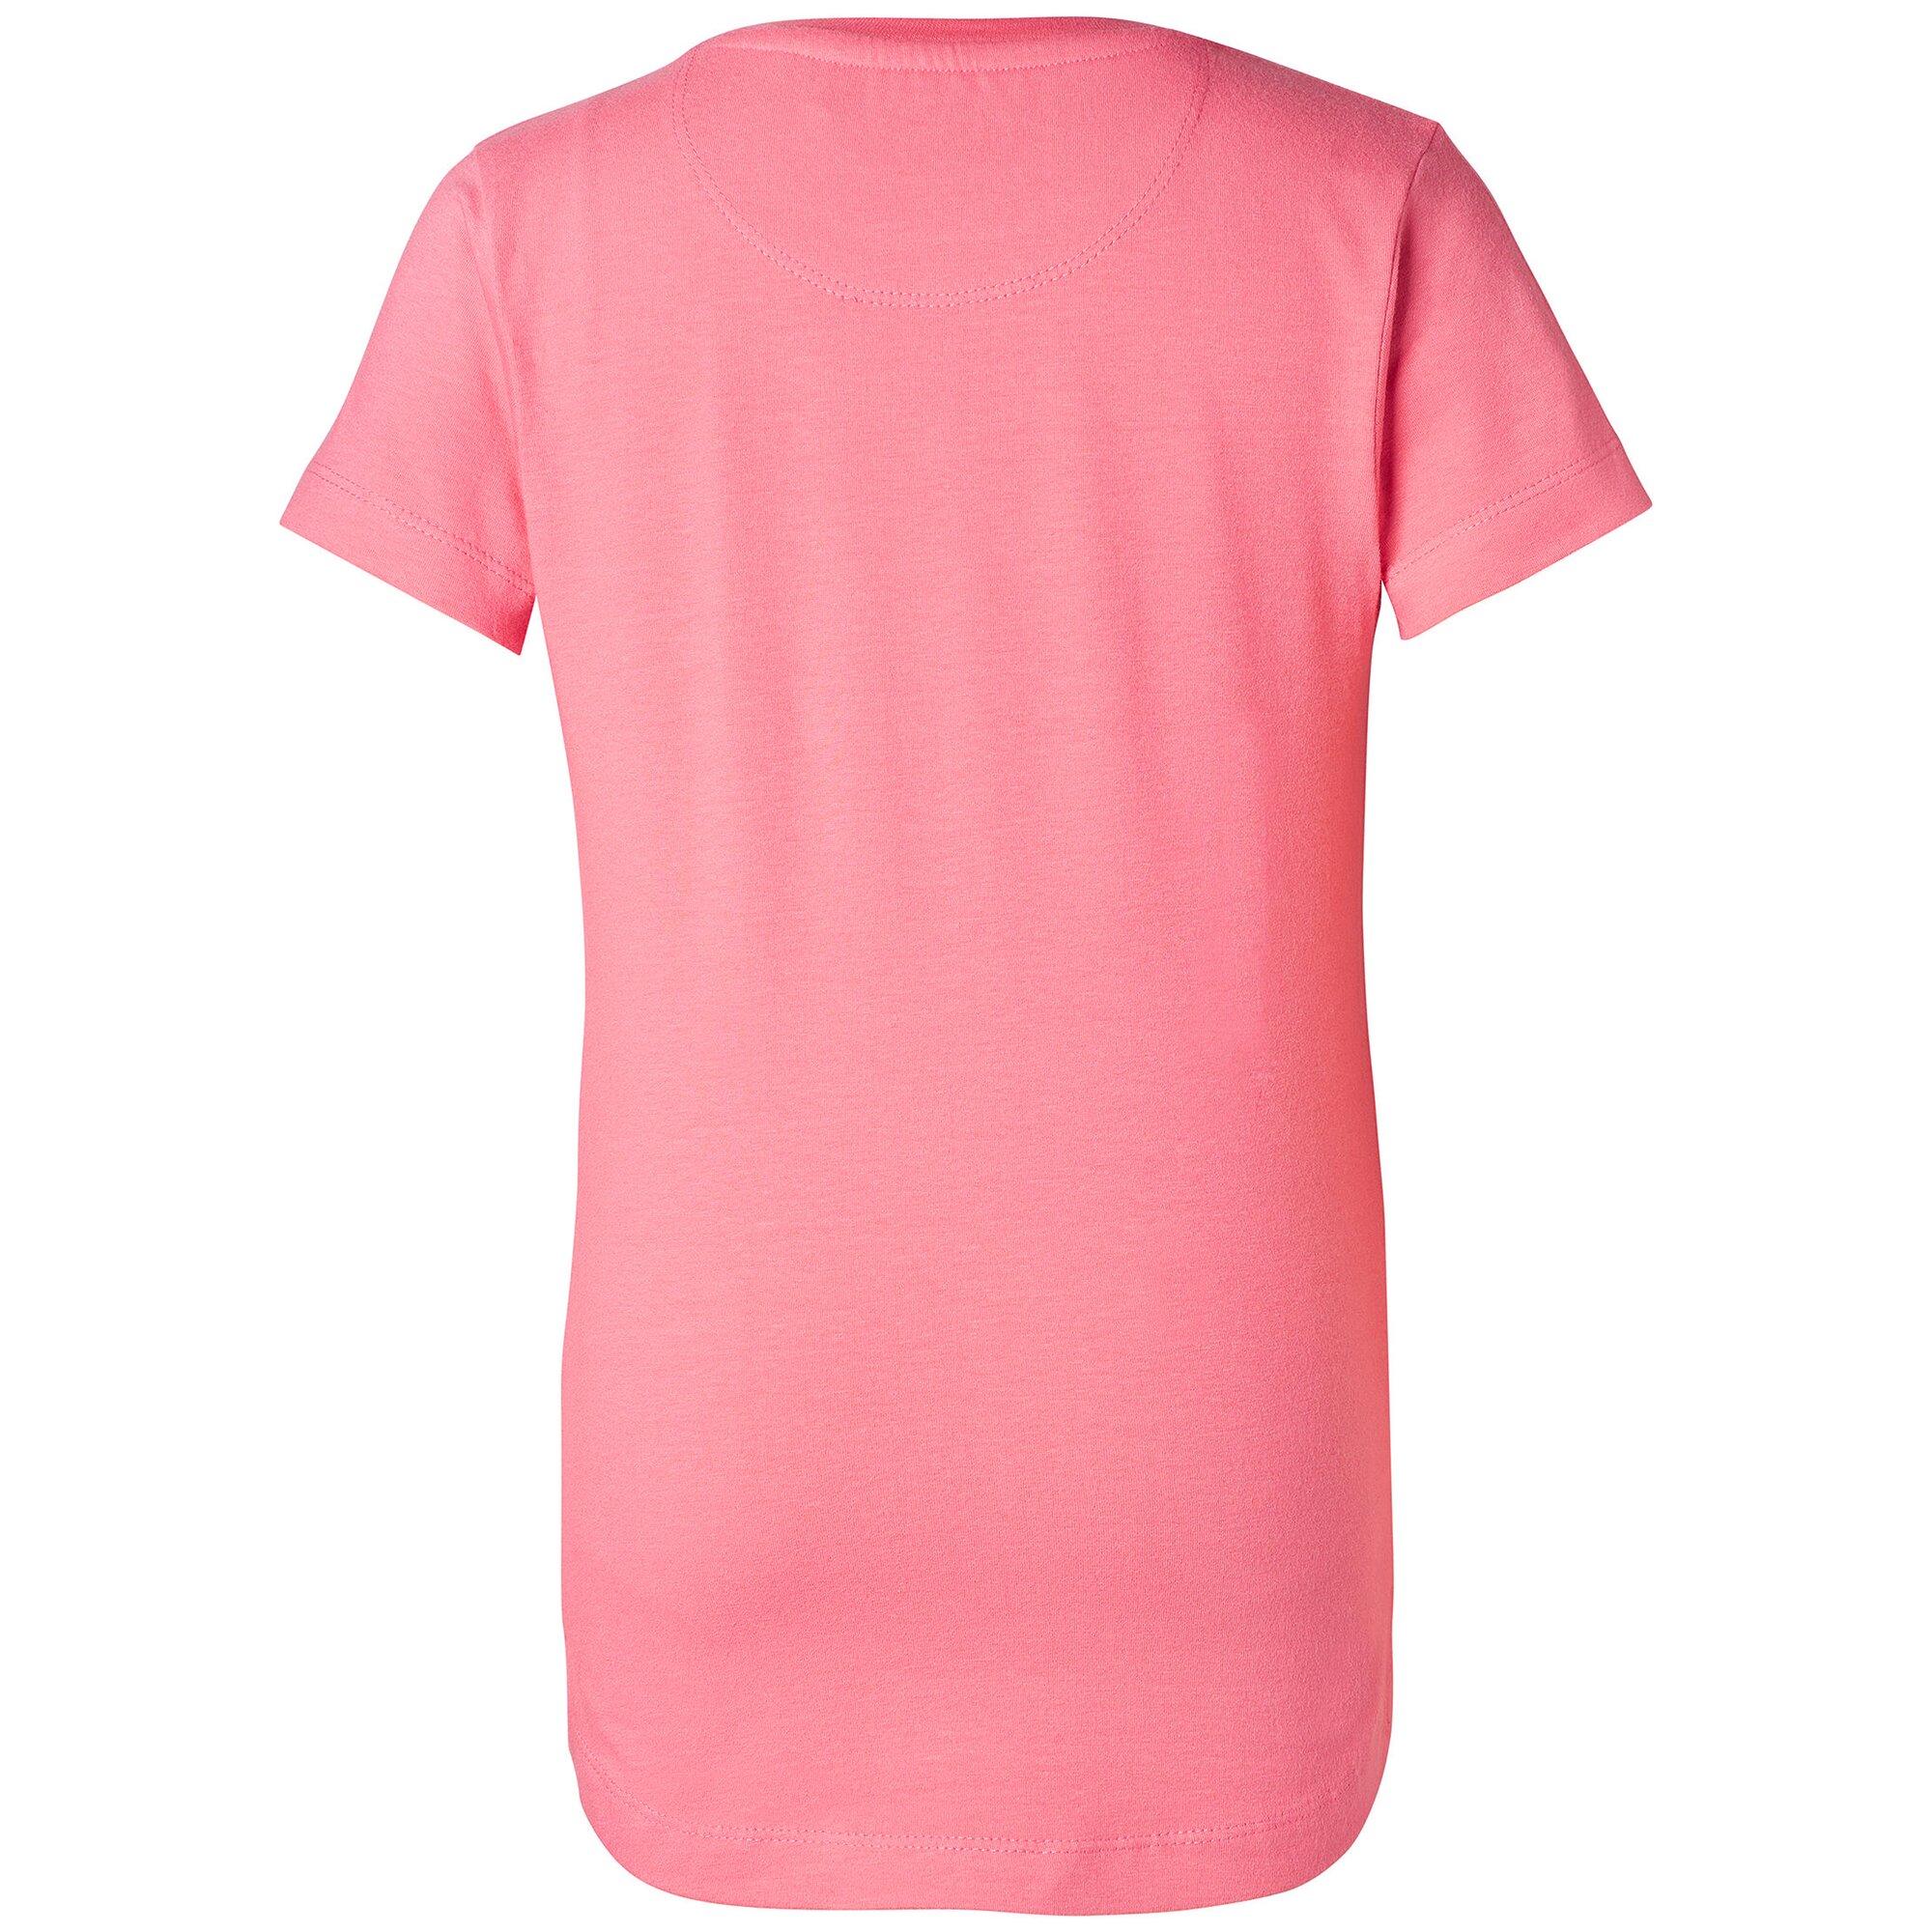 schildkrot-fun-sports-t-shirt-kirkwood